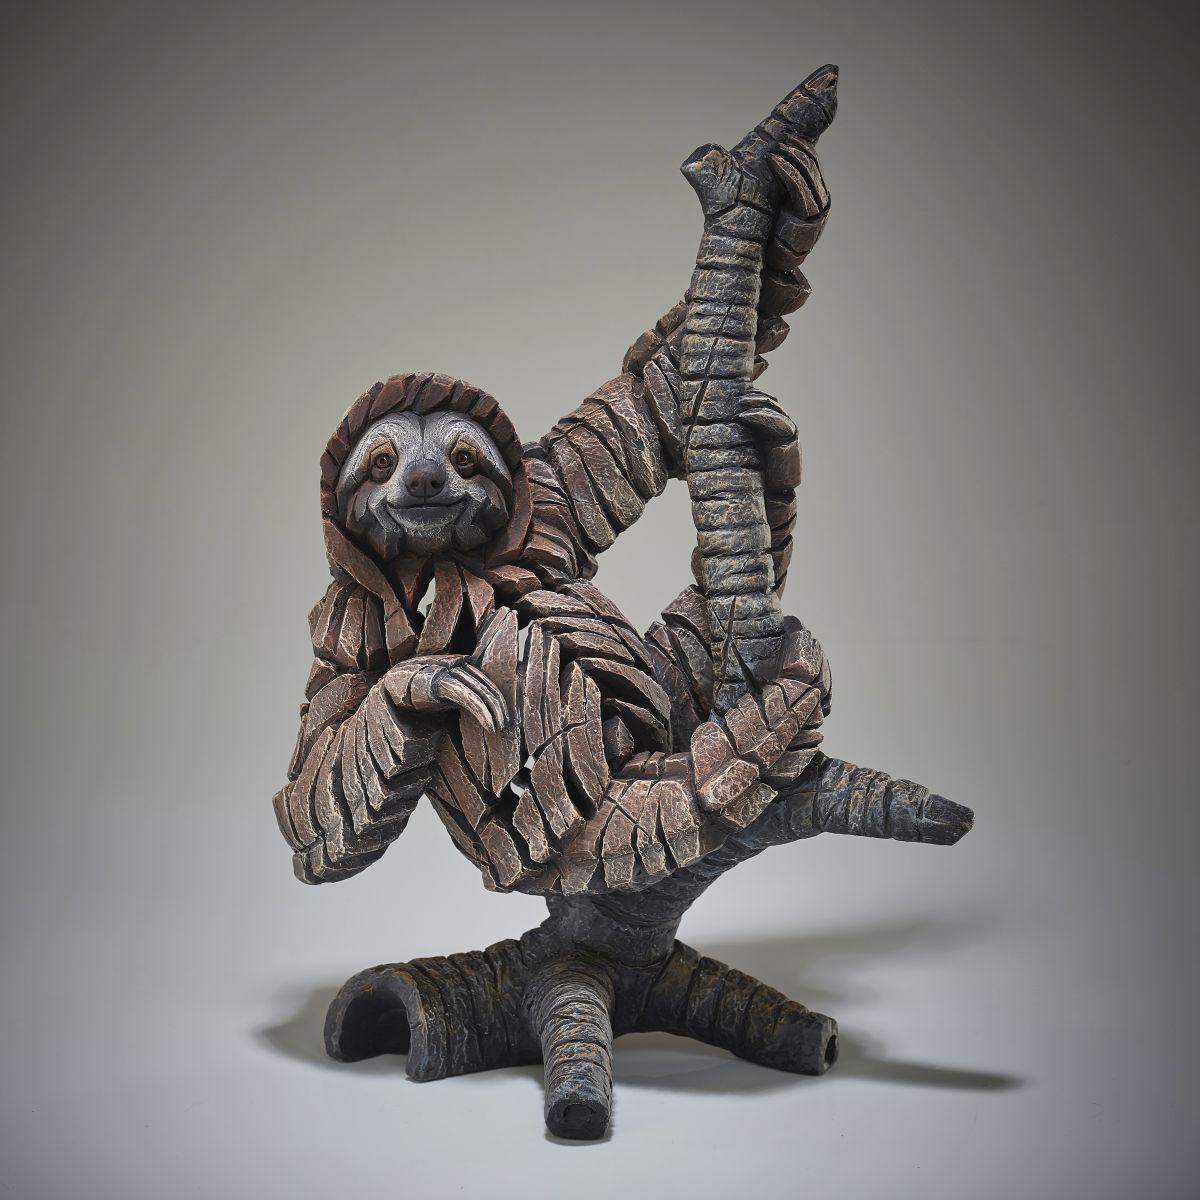 Edge Sloth